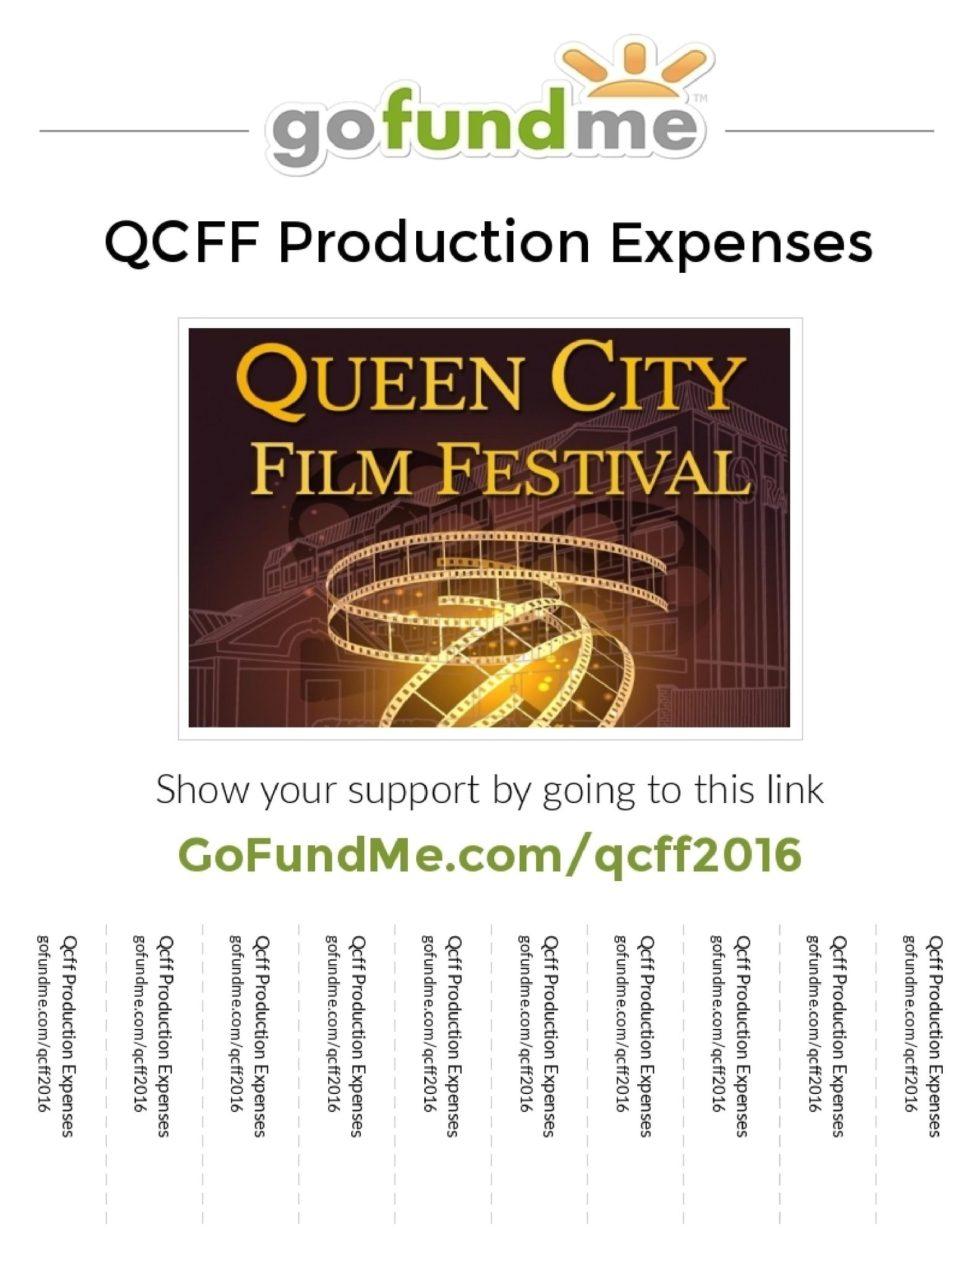 qcff 2016 gofundme-page-001